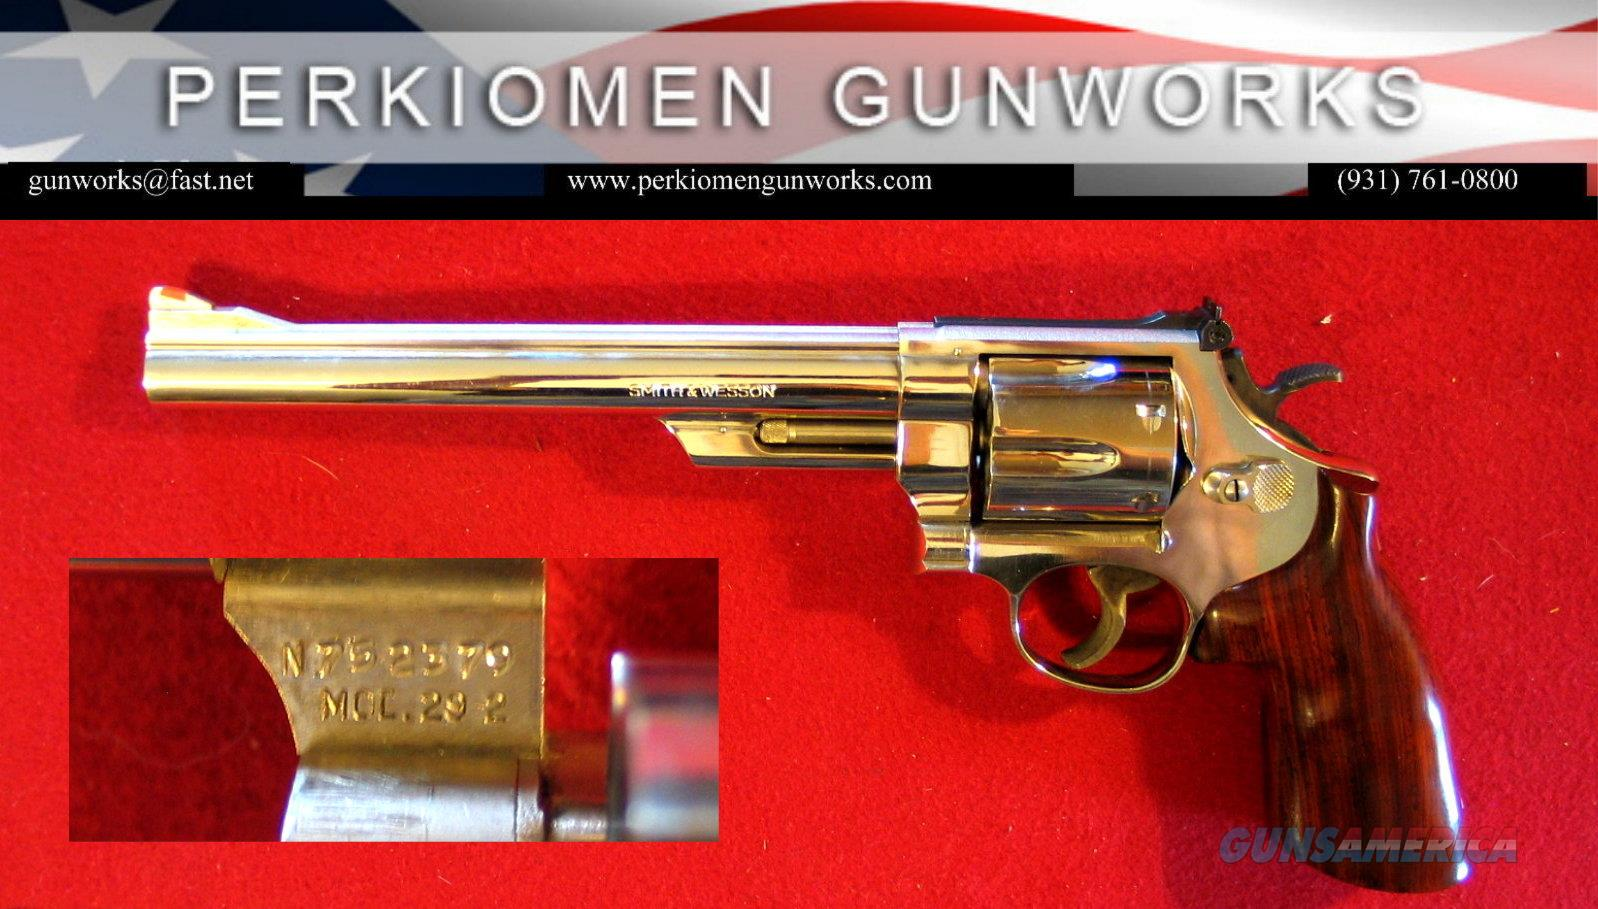 "M-29-2, 44mag, 8 3/8 inch, ""The .44 Magnum"", Nickel  Guns > Pistols > Smith & Wesson Revolvers > Full Frame Revolver"